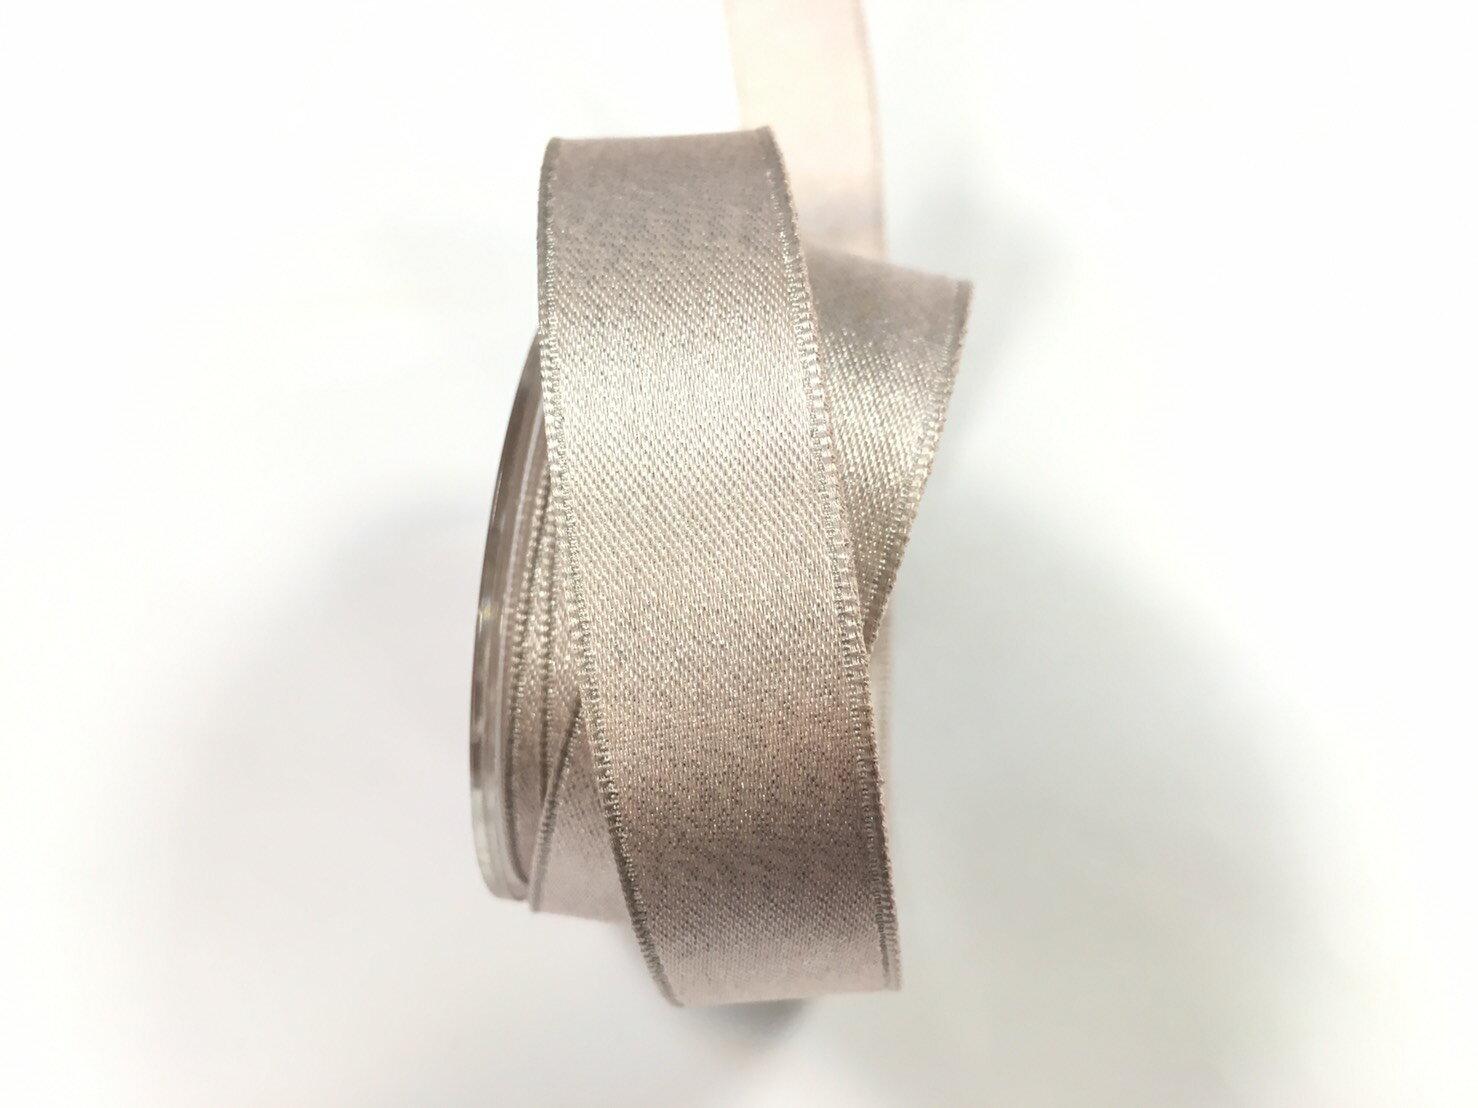 【Crystal Rose緞帶專賣店】金粉緞面鐵絲帶  3碼 (10色) 1